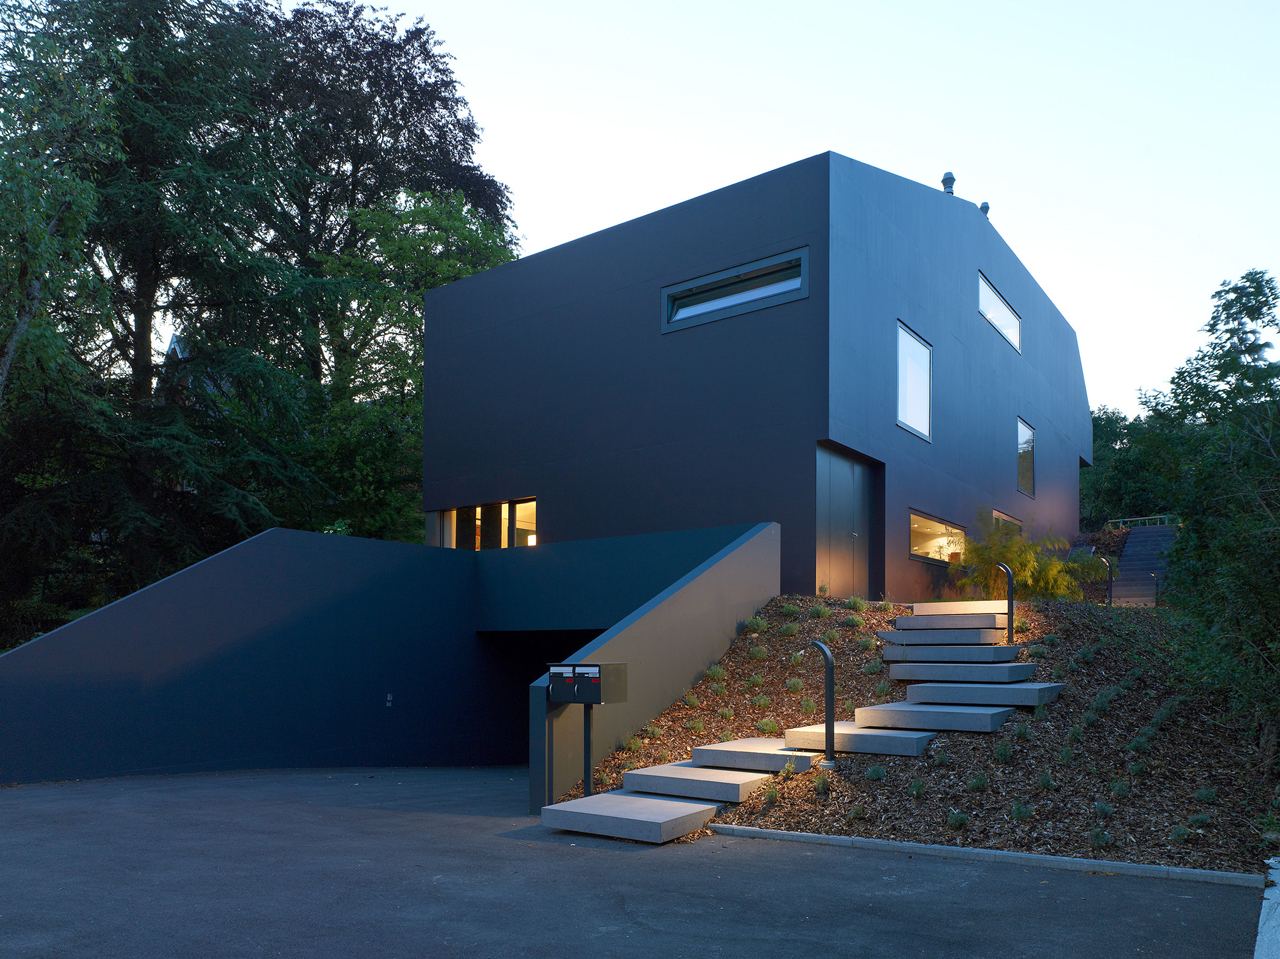 Schuler Villa / andrea pelati architecte, © Thomas Jantscher